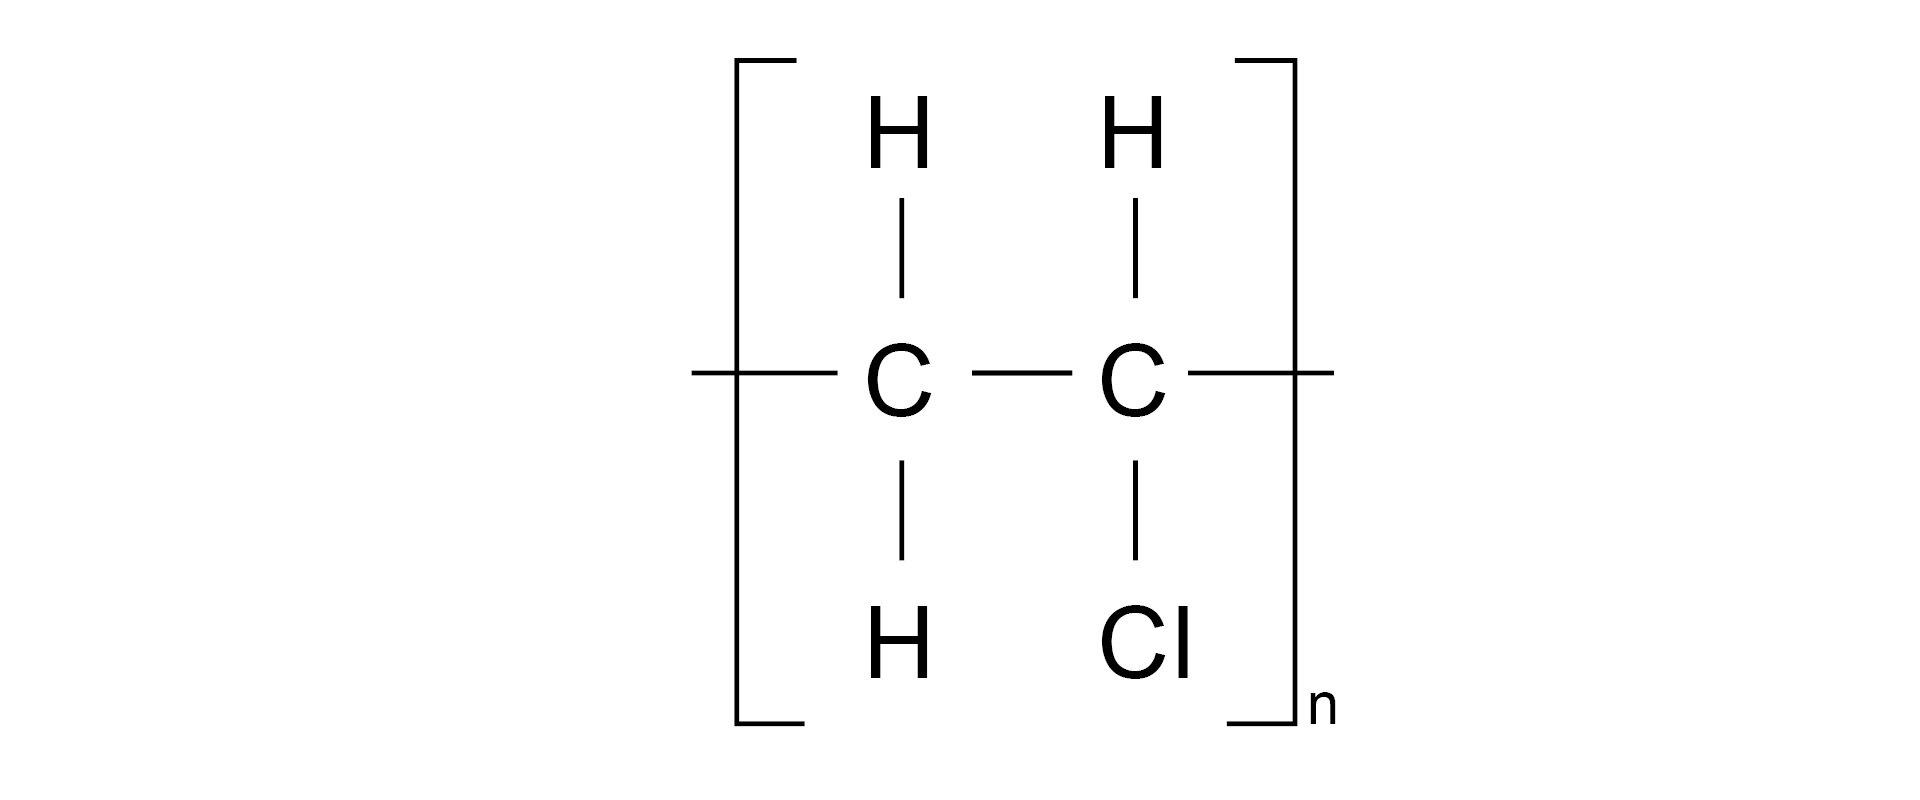 Ilustracja pokazuje wzór strukturalny polichlorku winylu.